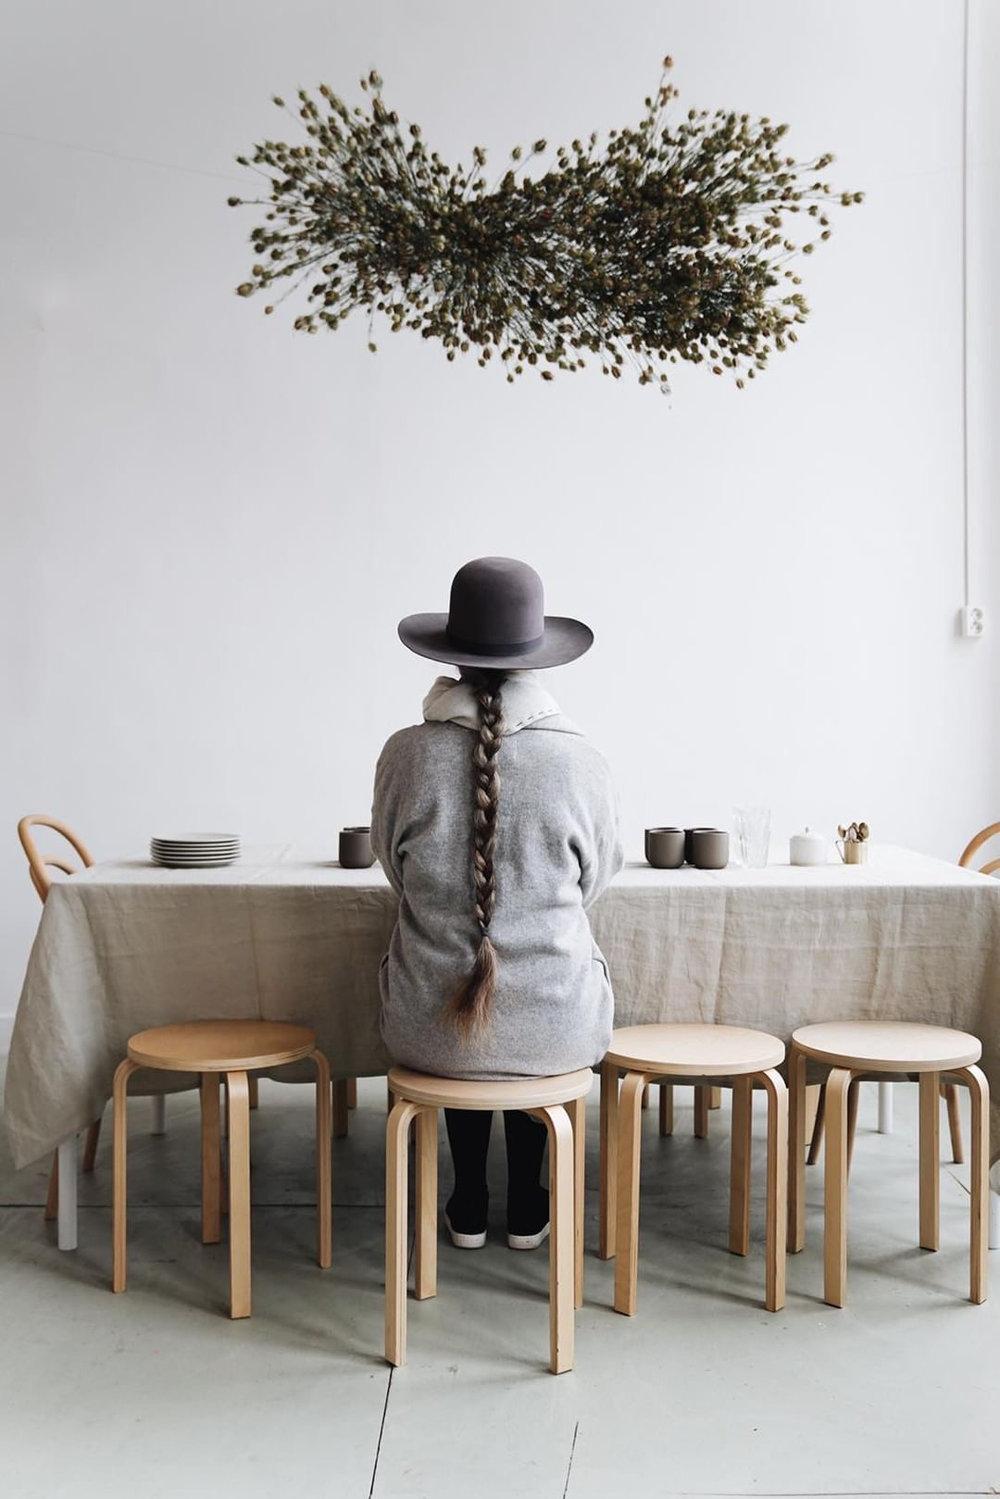 photography by Kristel Margo, styling Marieke Verdenius